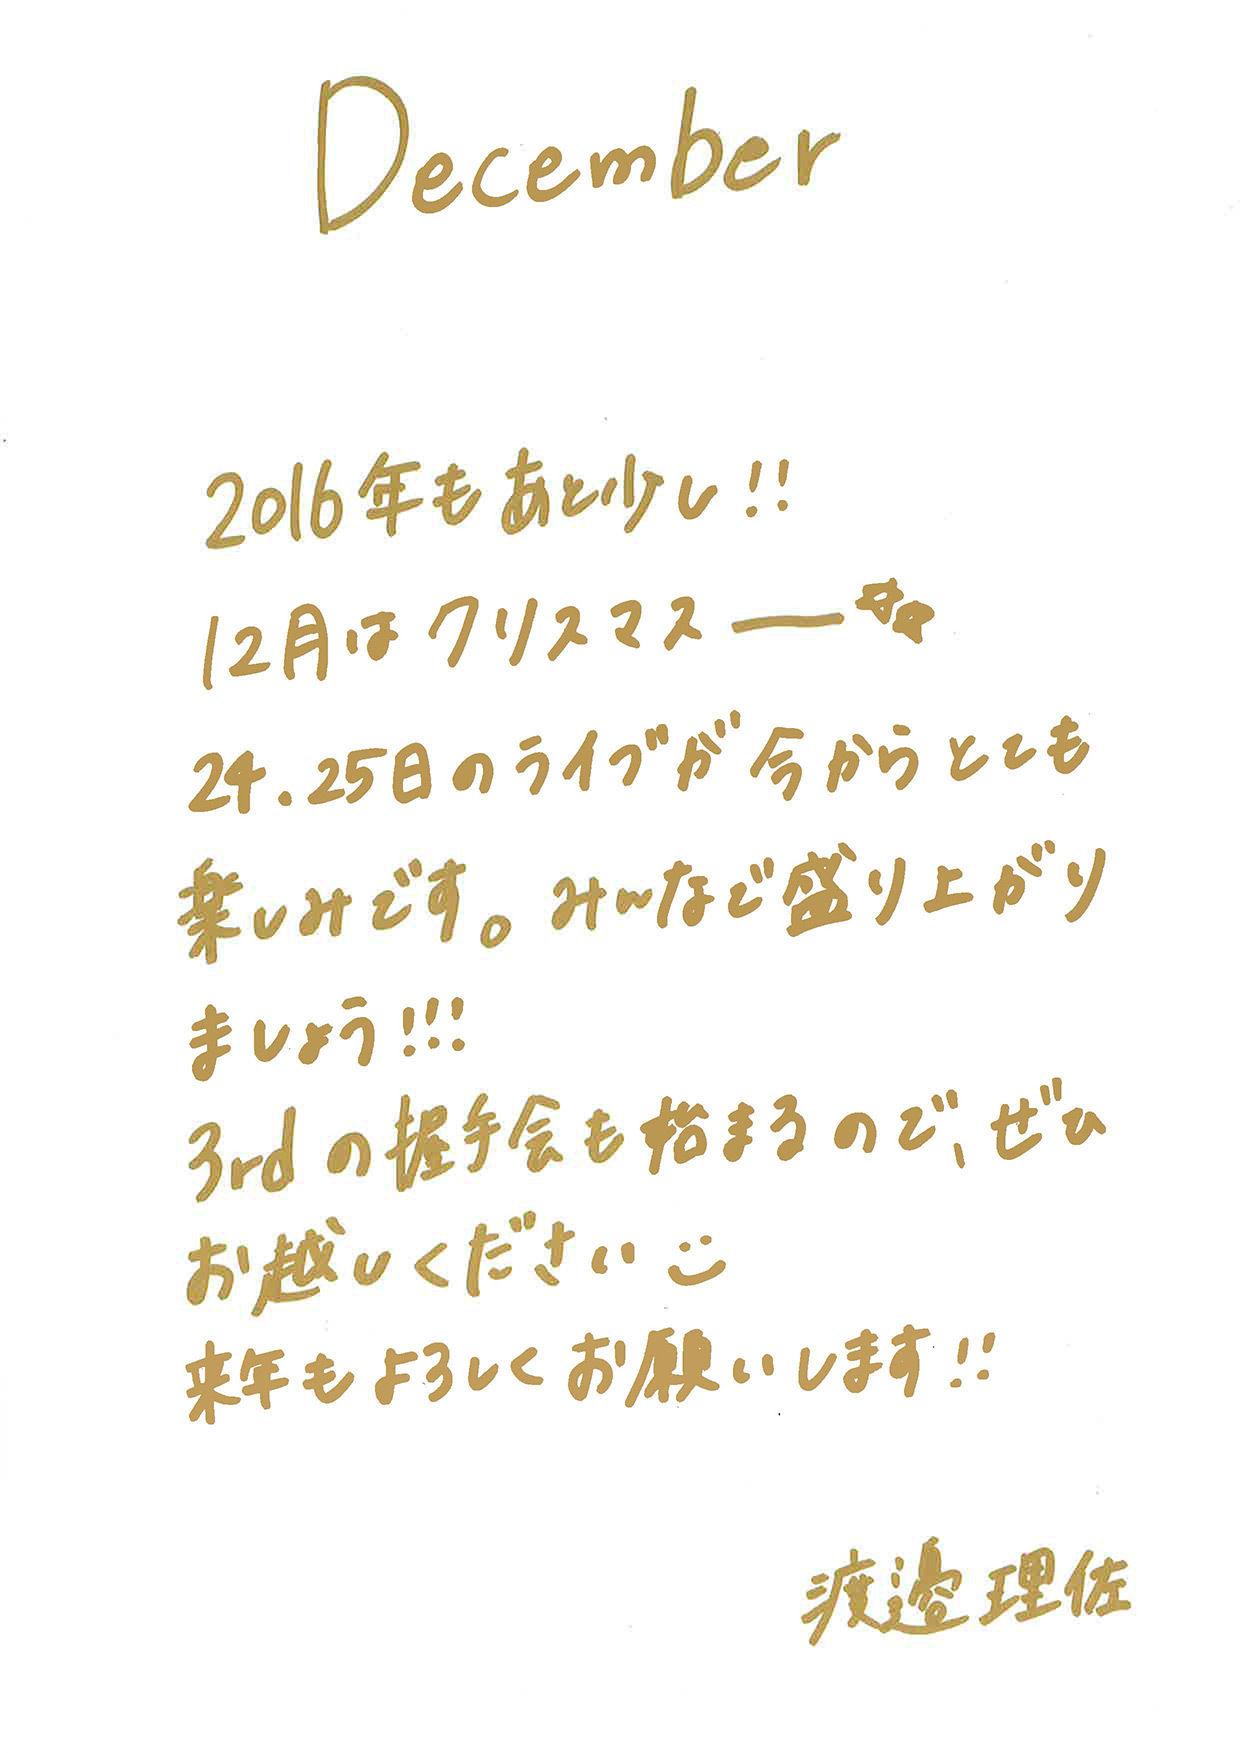 g201612_21_ef5vwqcwy_jpg